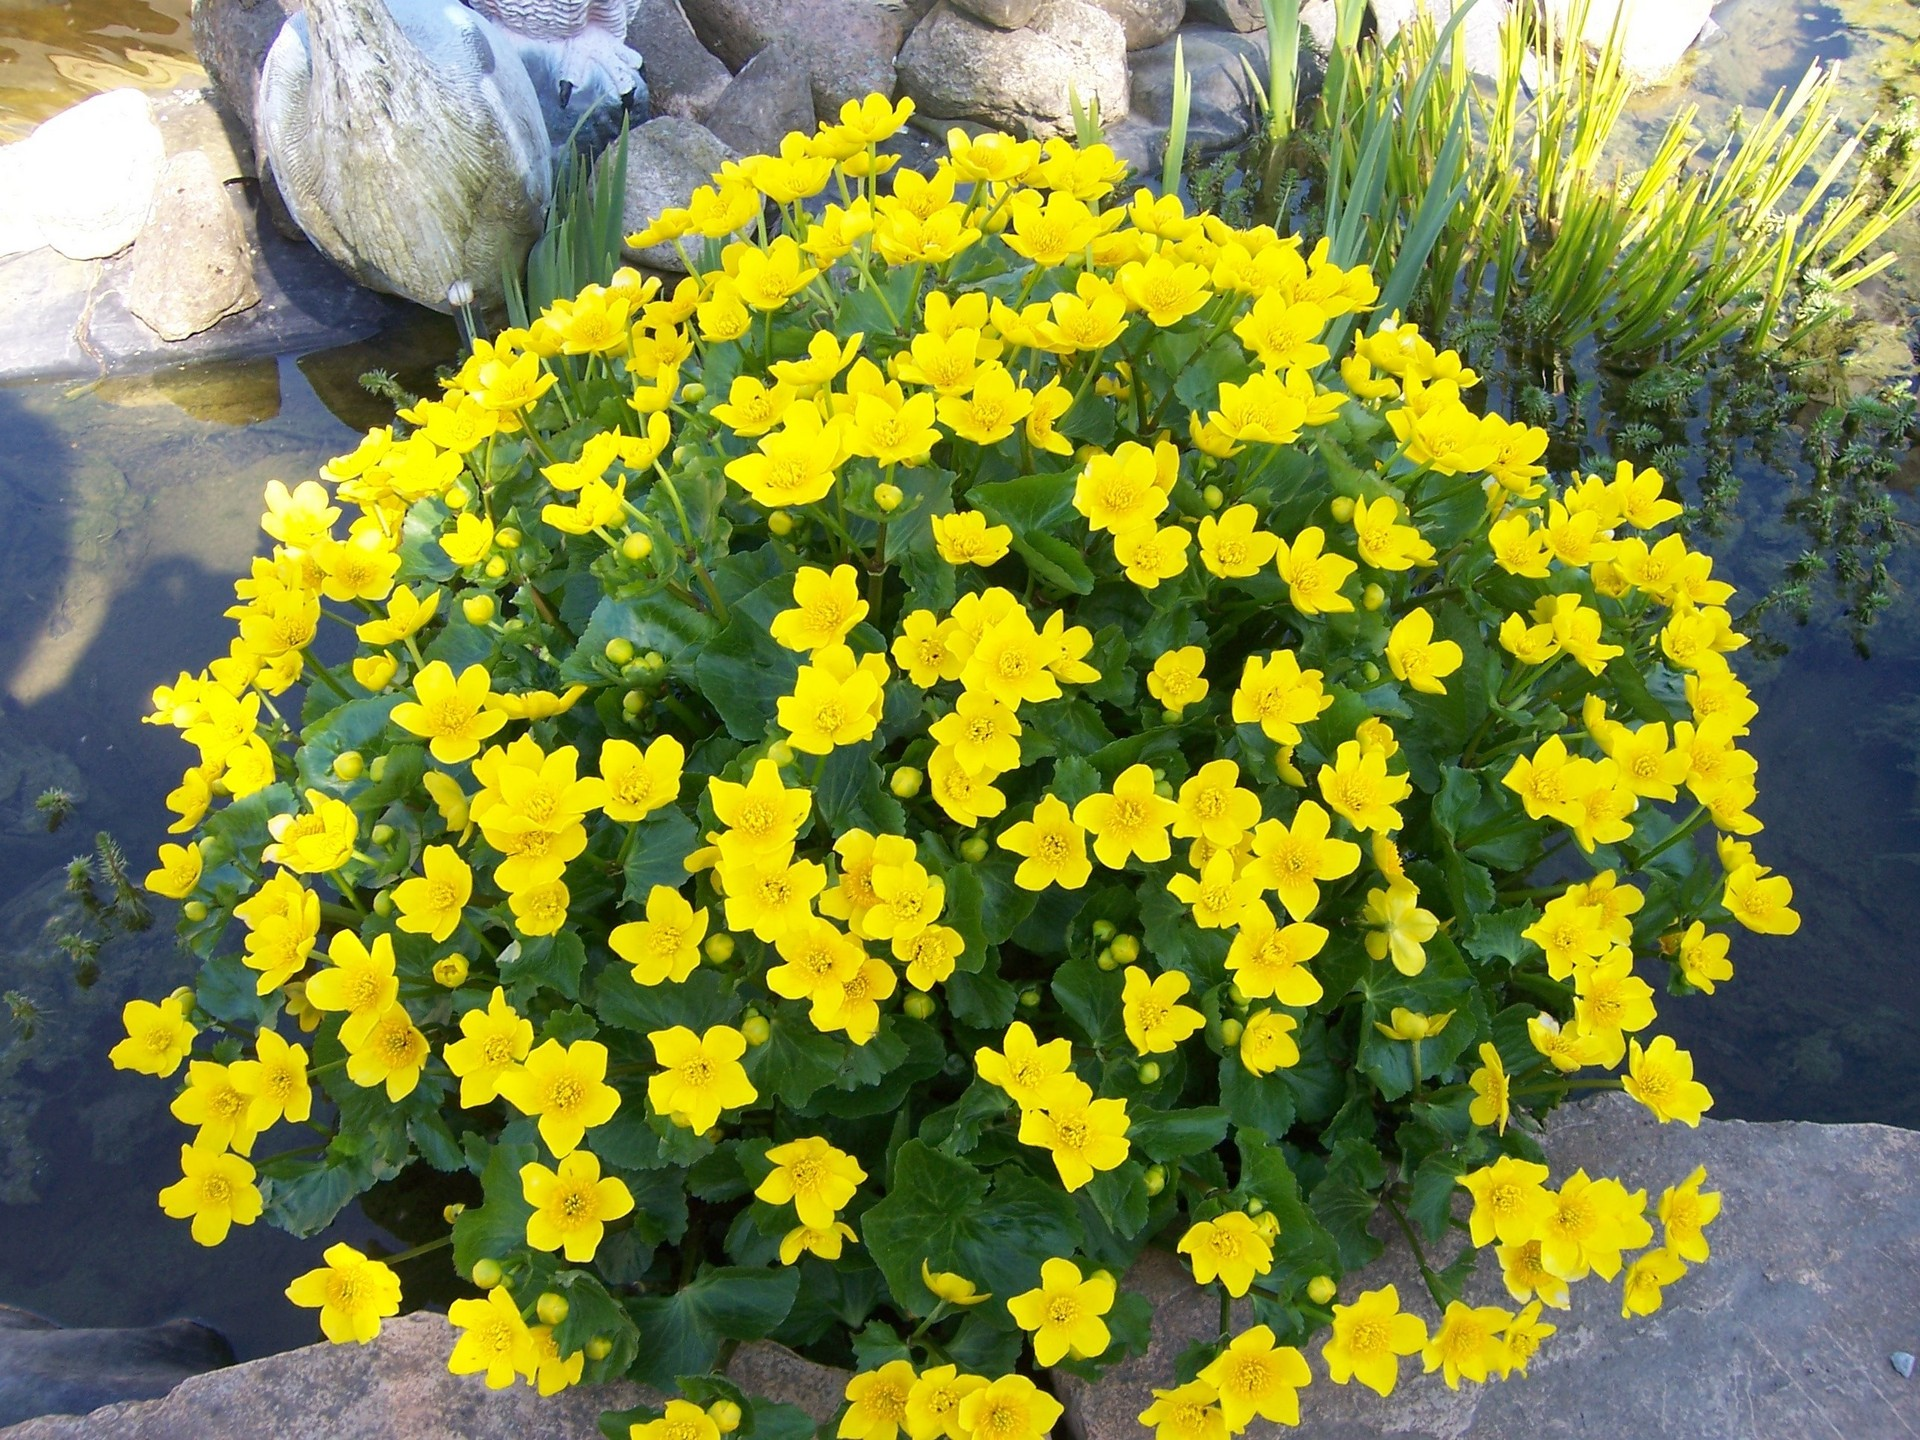 Spring Flowers Gardening Wallpaper 1145566 Fanpop